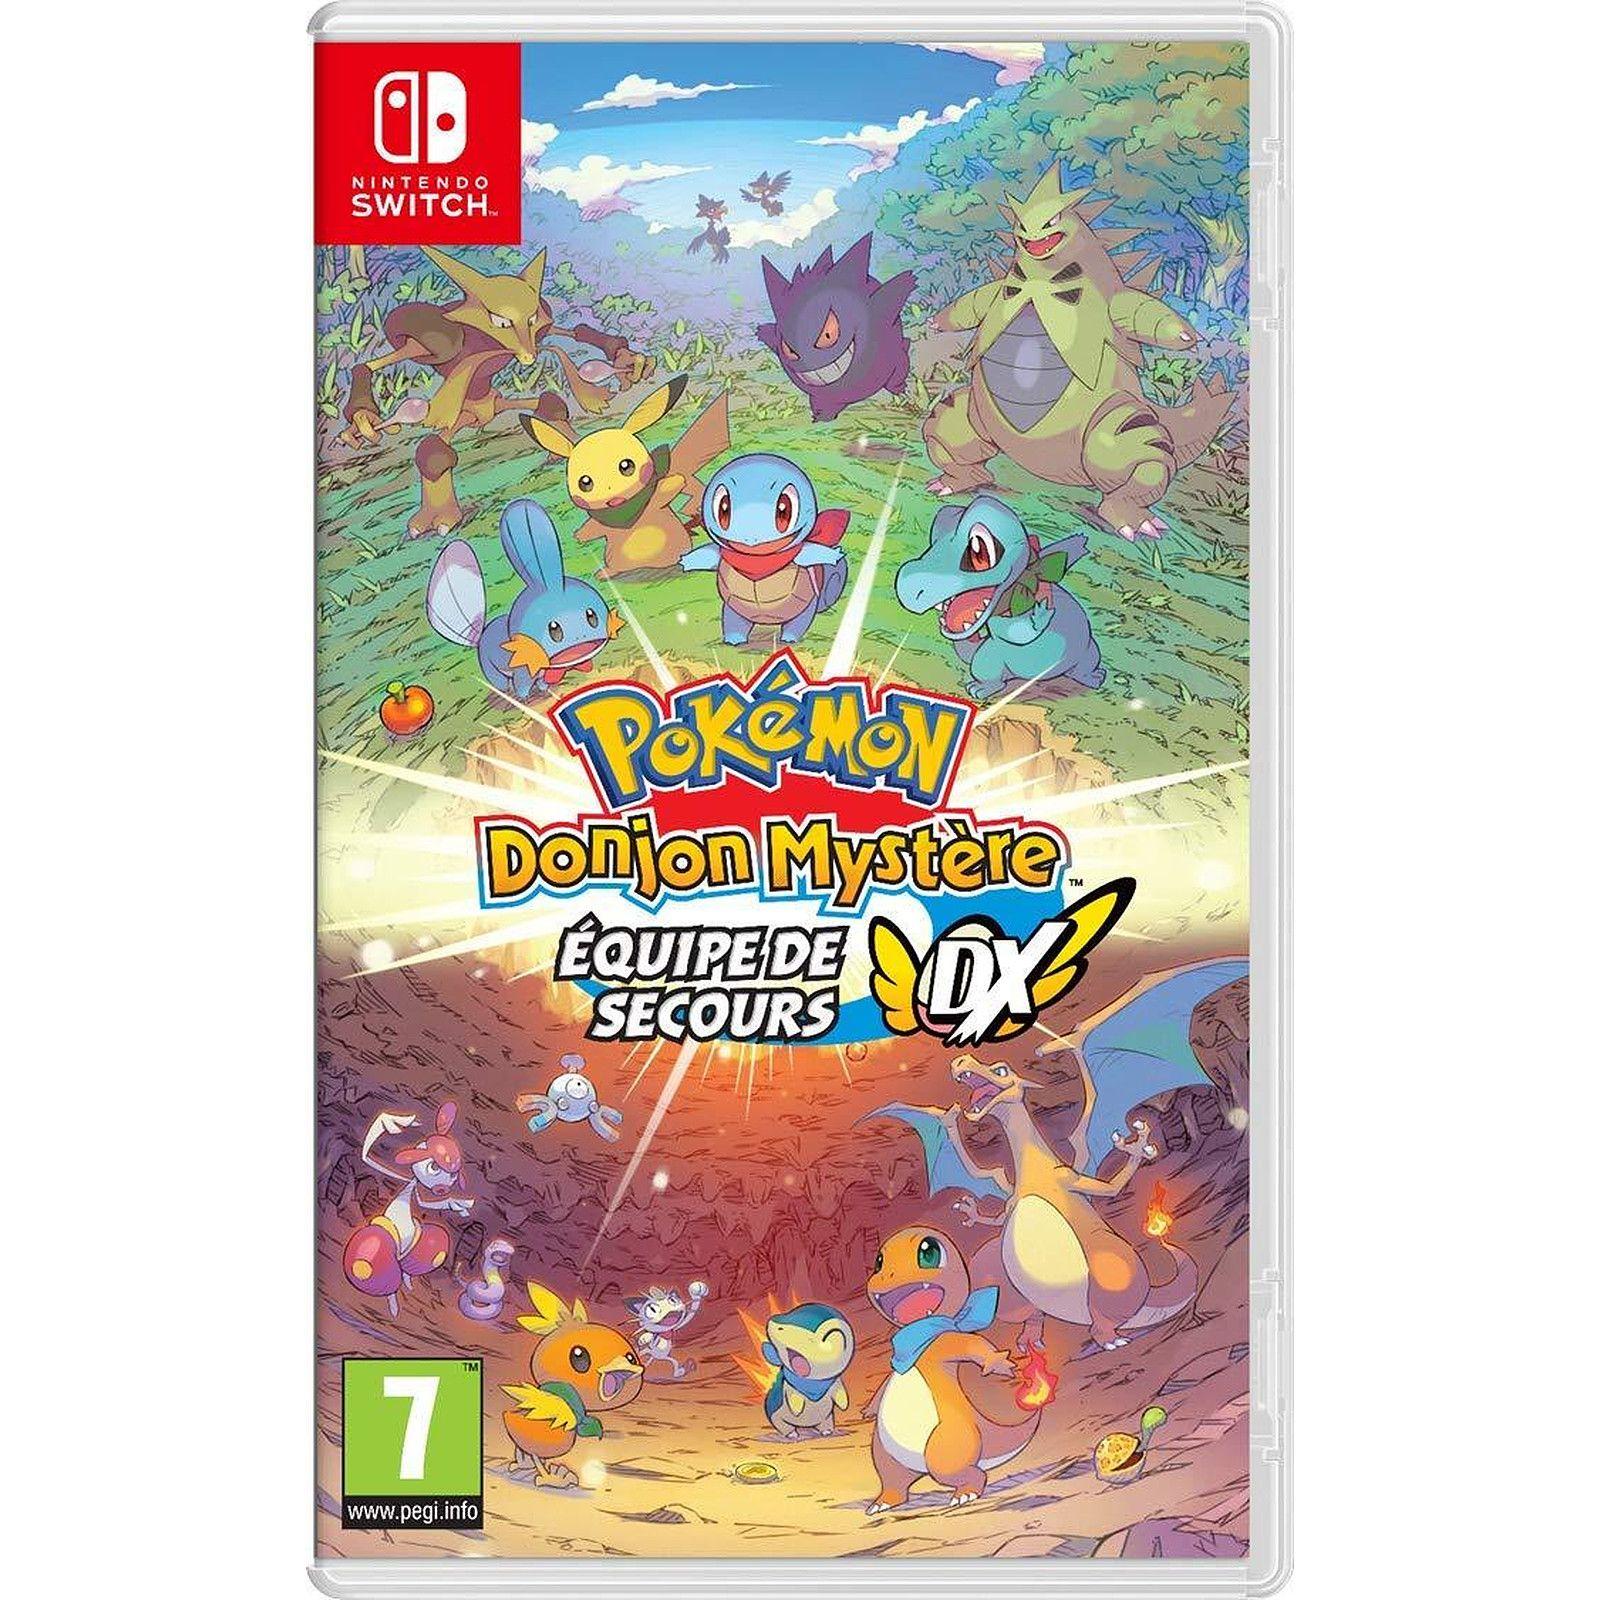 Pokemon Mistery Dungeon: Retterteam DX (Nintendo Switch, PEGI, FR Import)